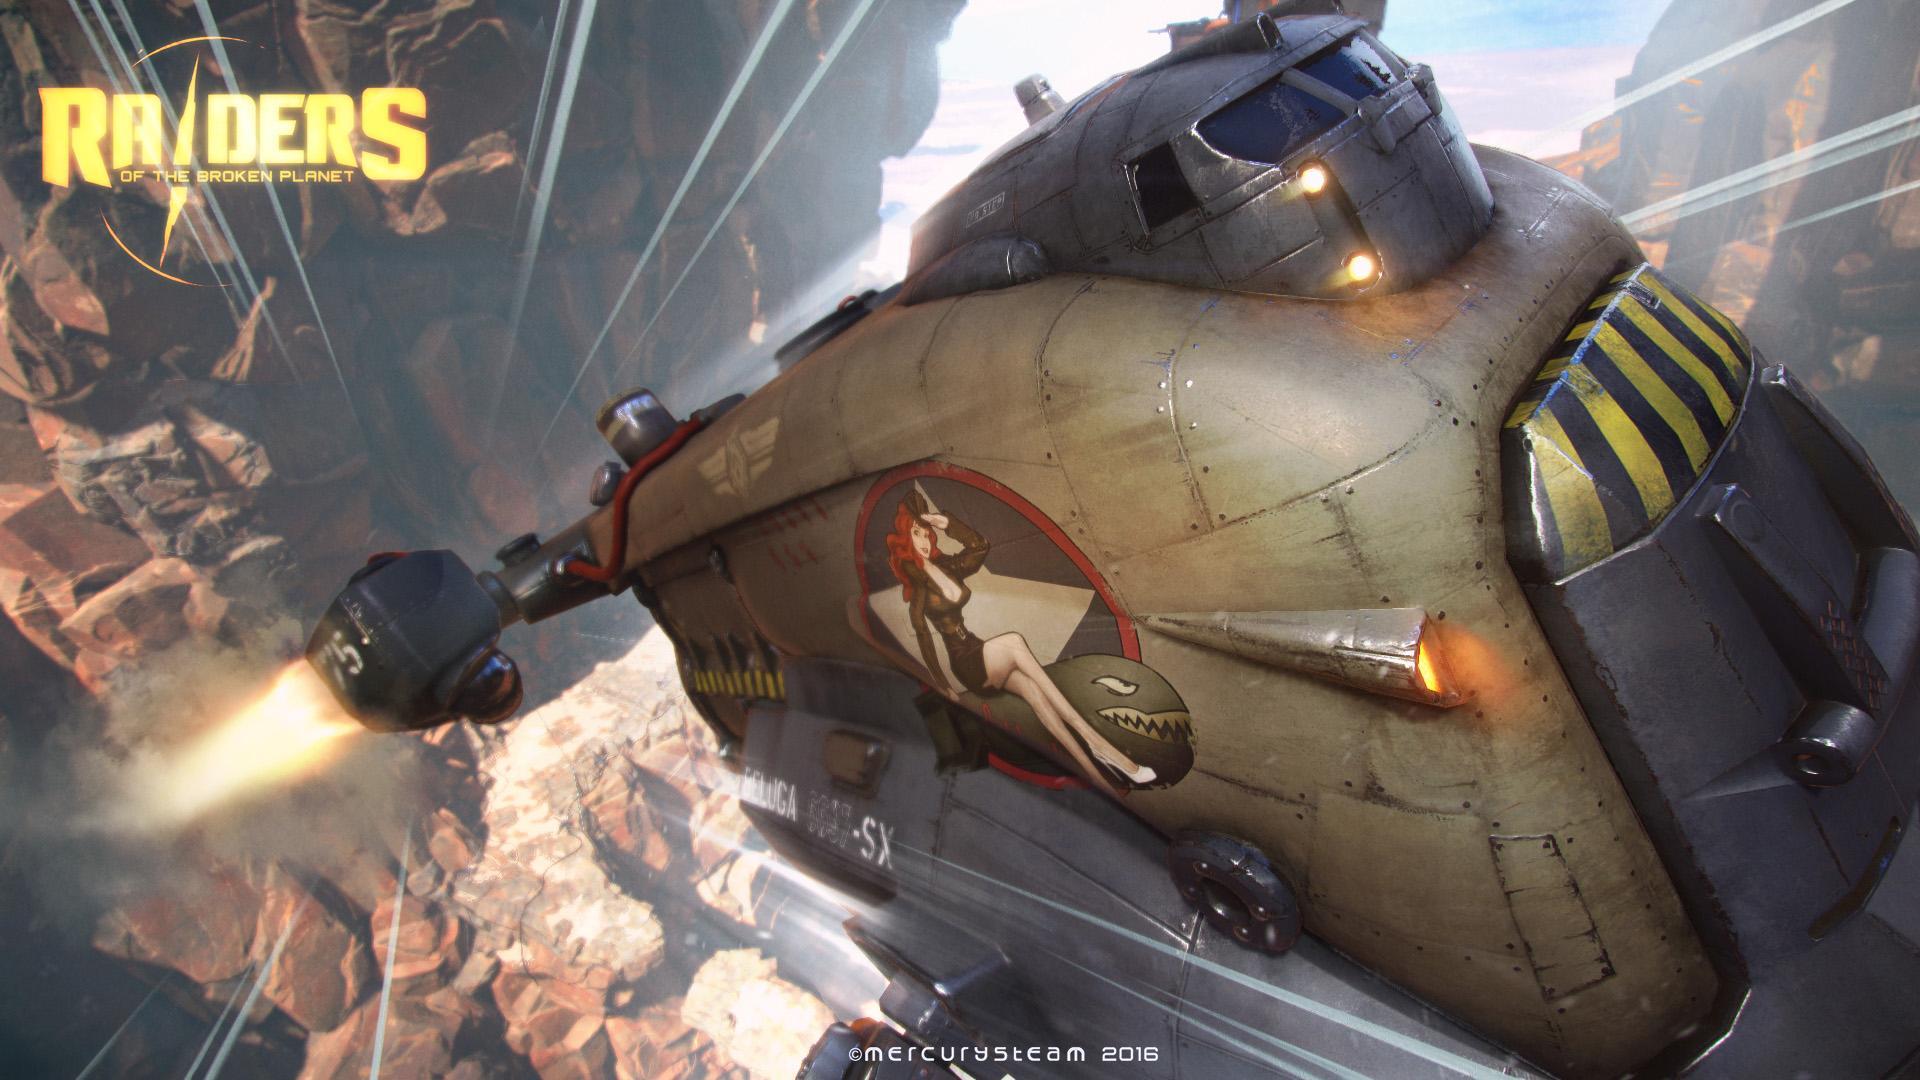 raiders-of-the-broken-planet-chinh-thuc-duoc-mercurysteam-cong-bo-tin-game (1)